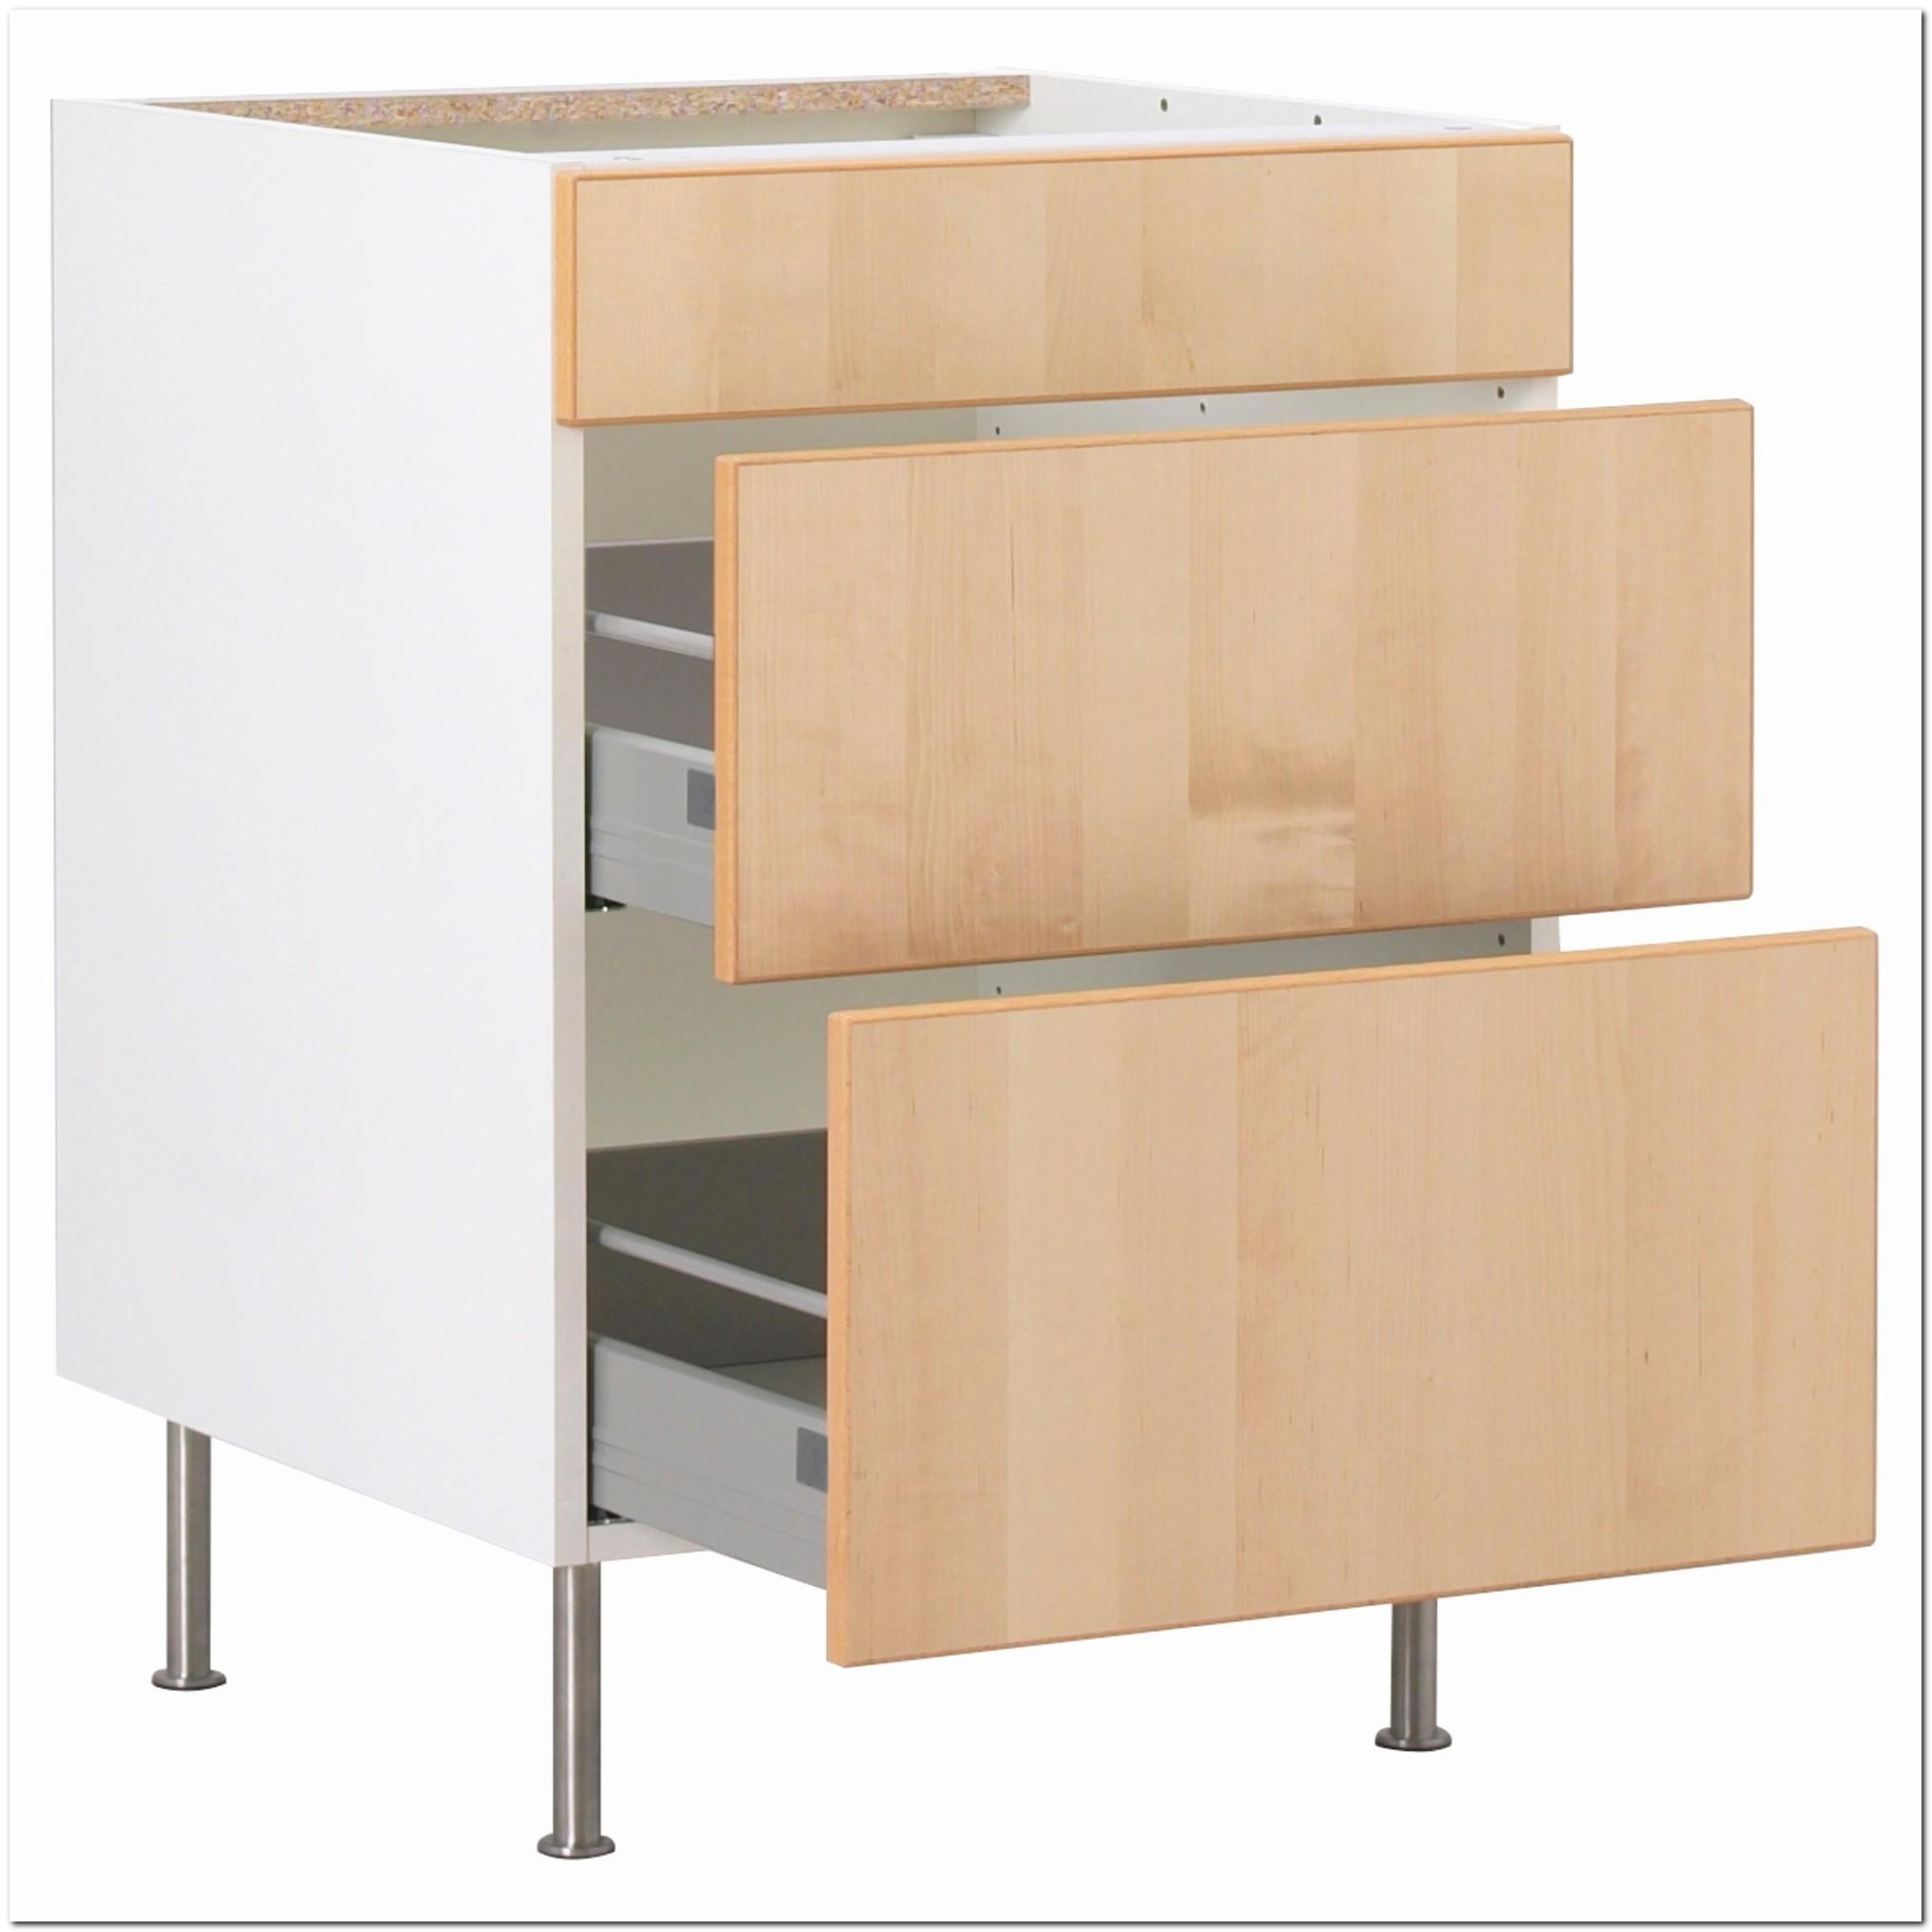 Meuble Bouteille De Gaz Ikea